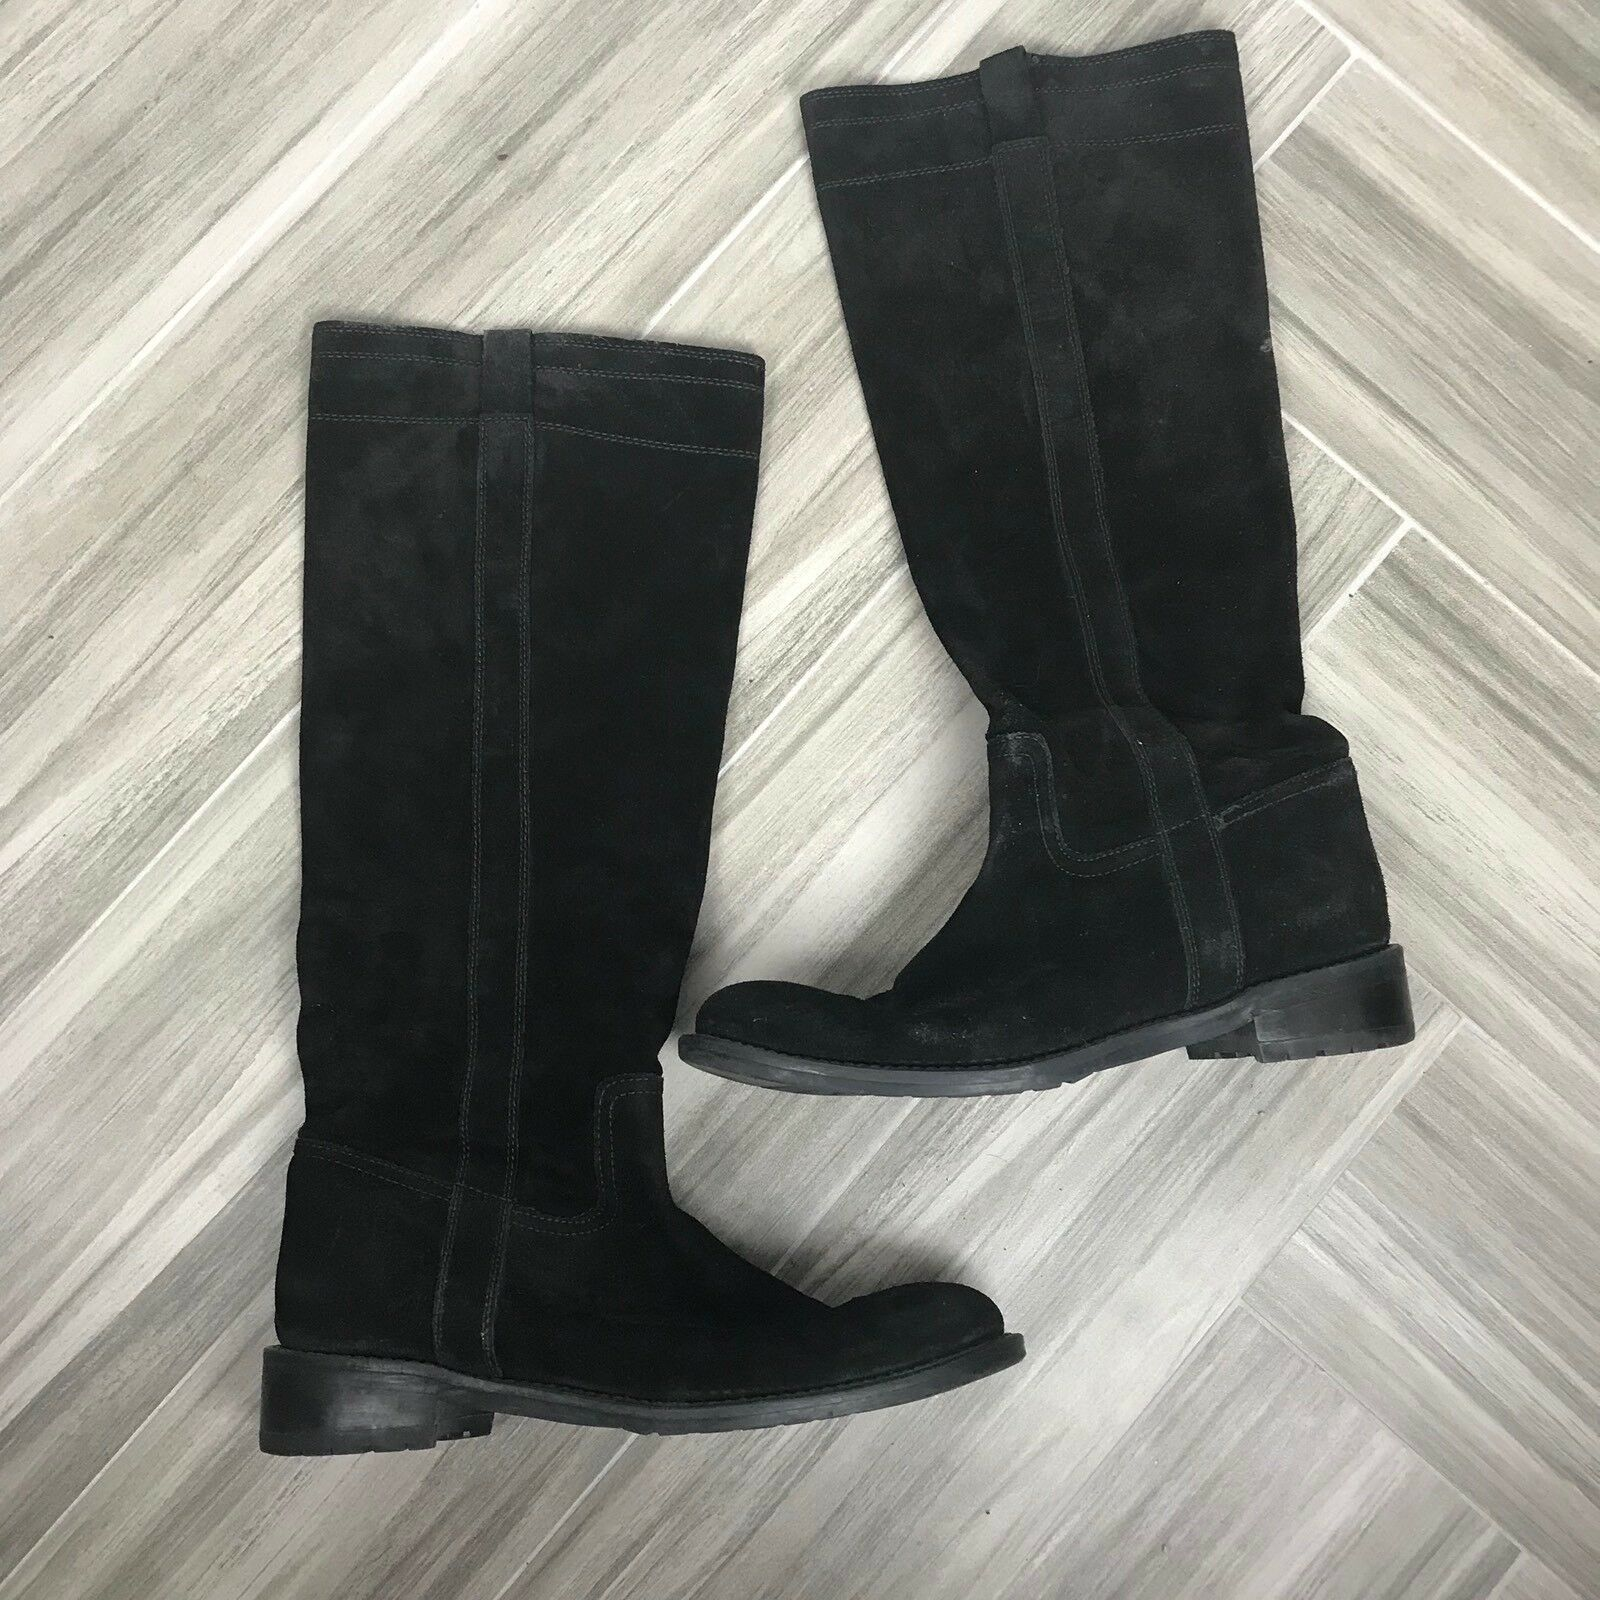 Barneys New York Womens Black Suede Flat Boots Size 40 Casual Slip On Block Heel